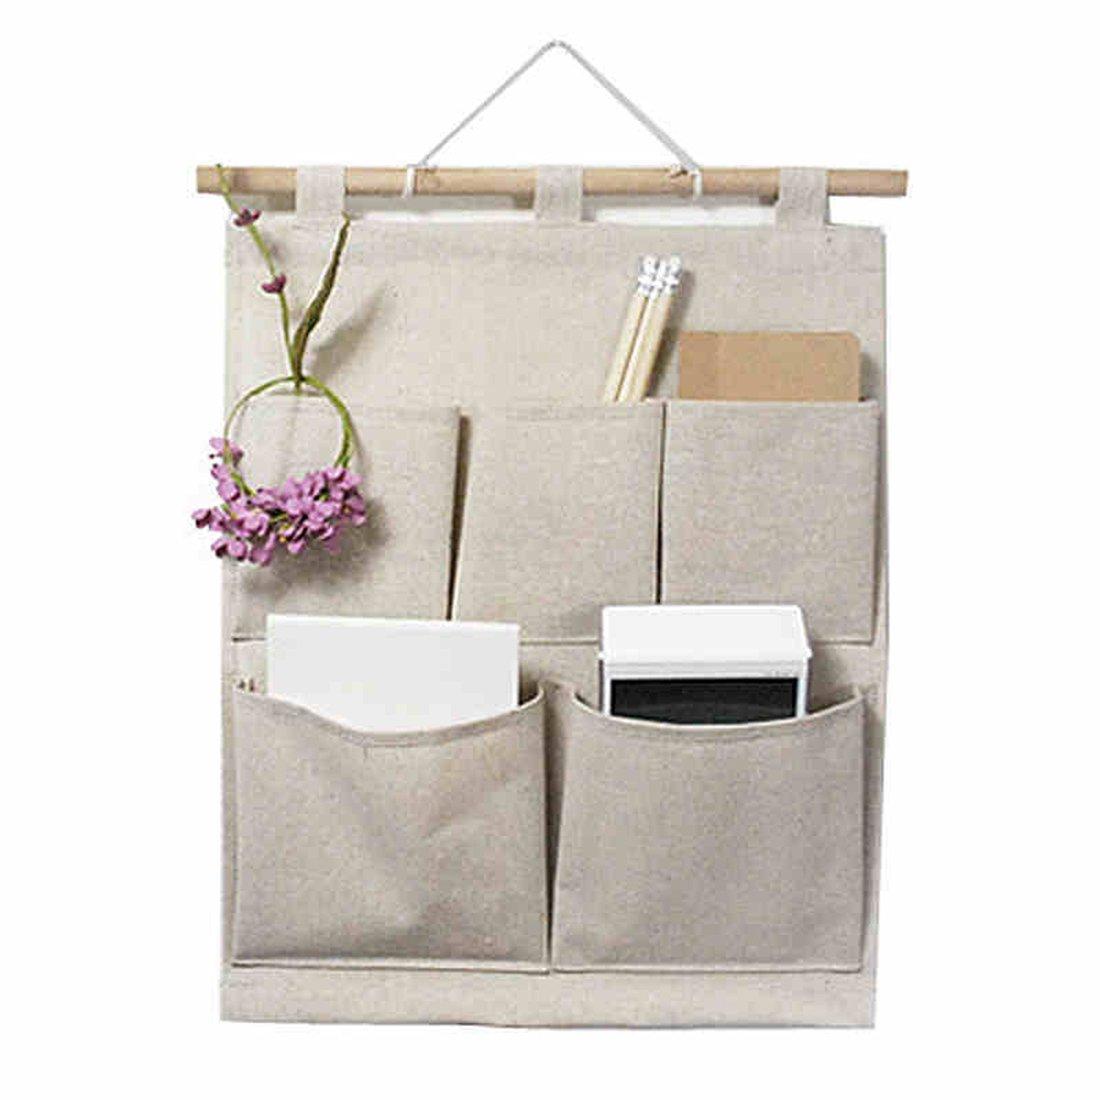 KINGREE Over The Door Magazine Storage Pockets, Wall Door Closet Hanging Storage Bag Organizer, (5 Pockets-Nature)